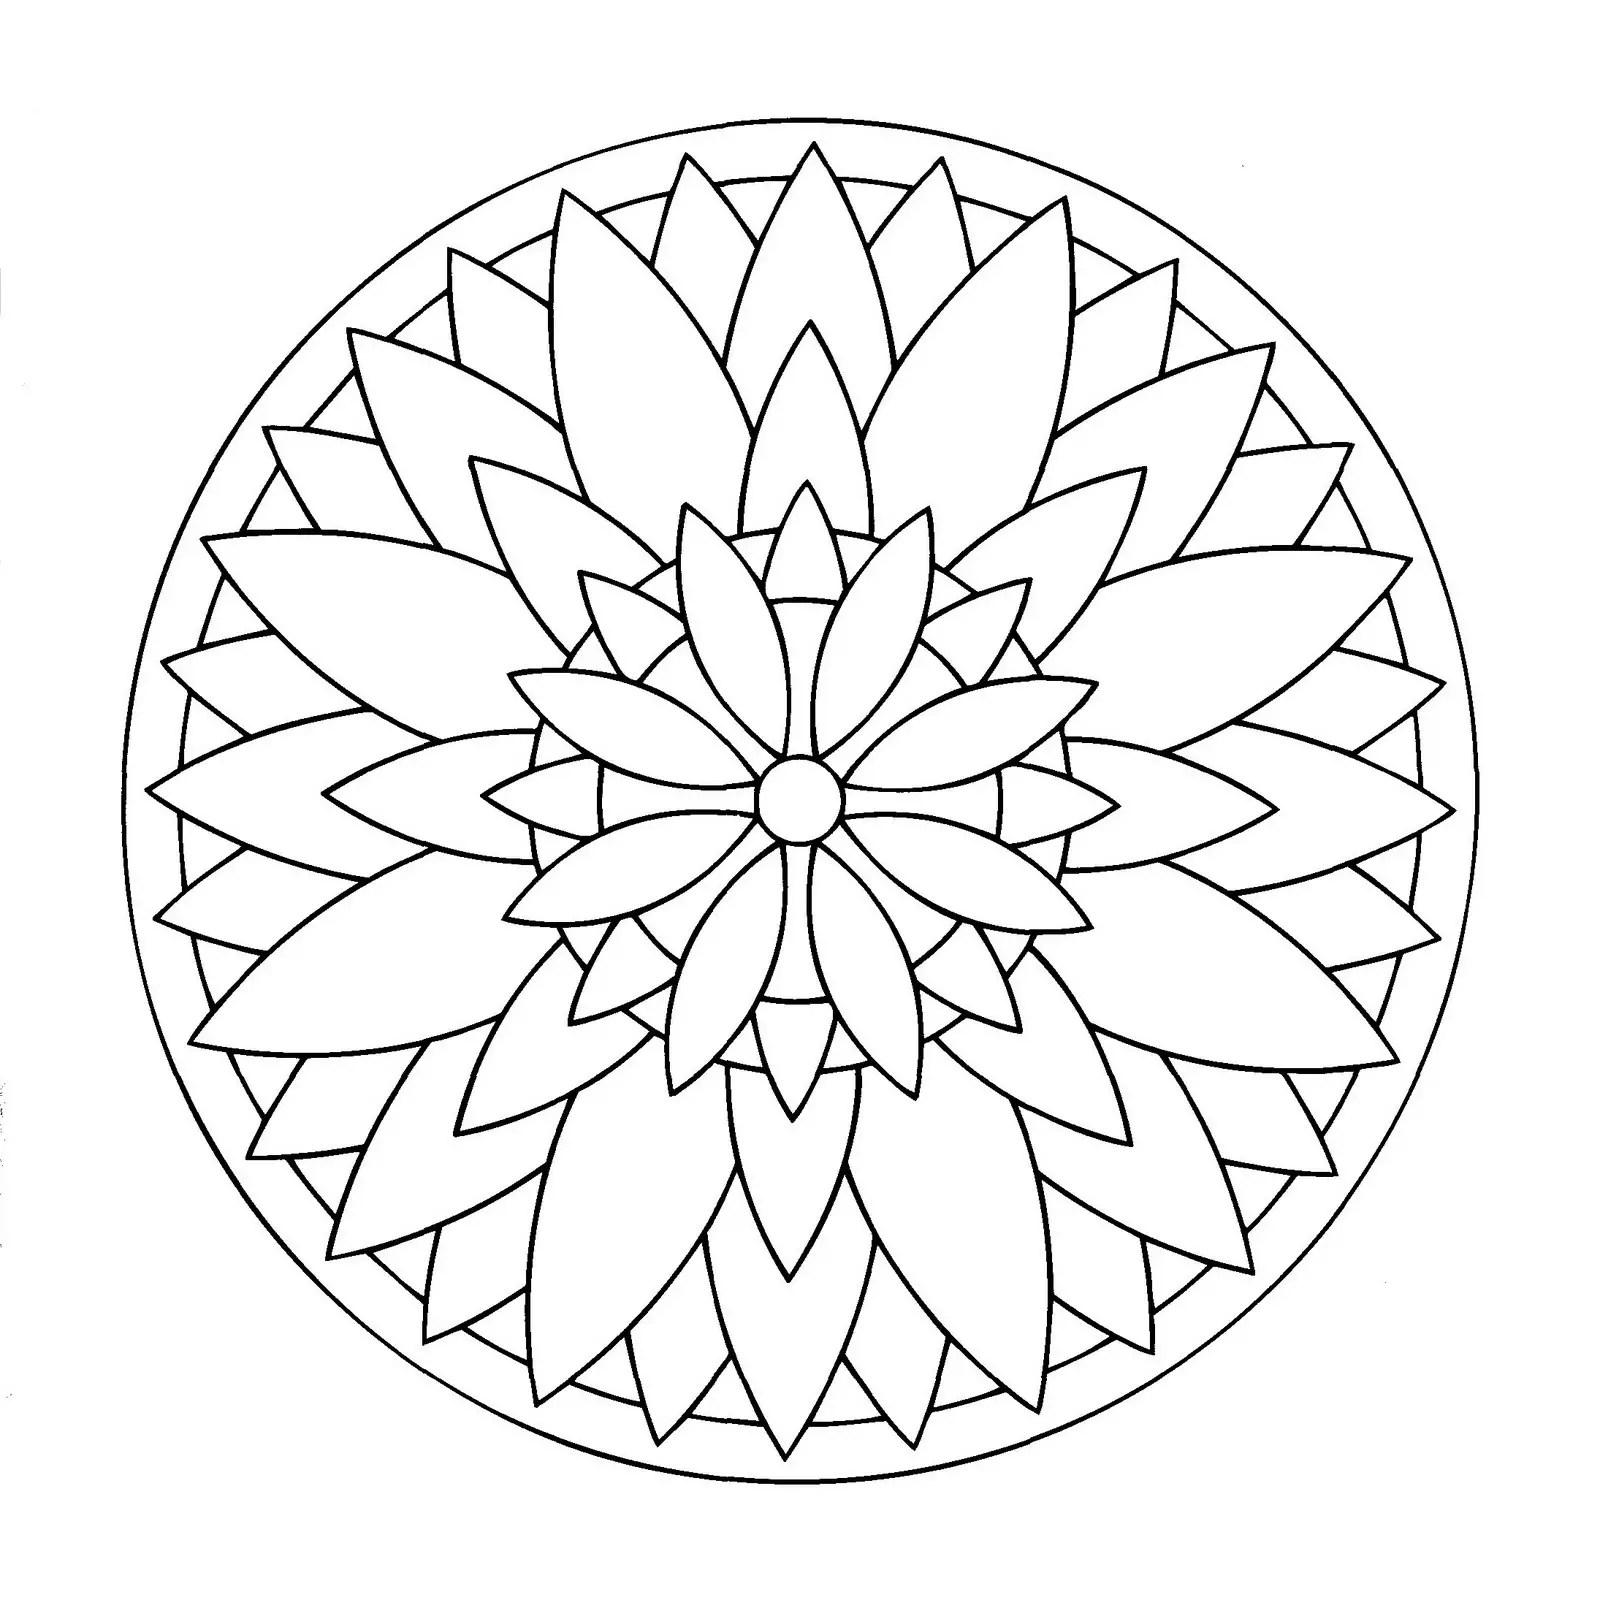 Como Dibujar Mandalas Faciles Para Ninos